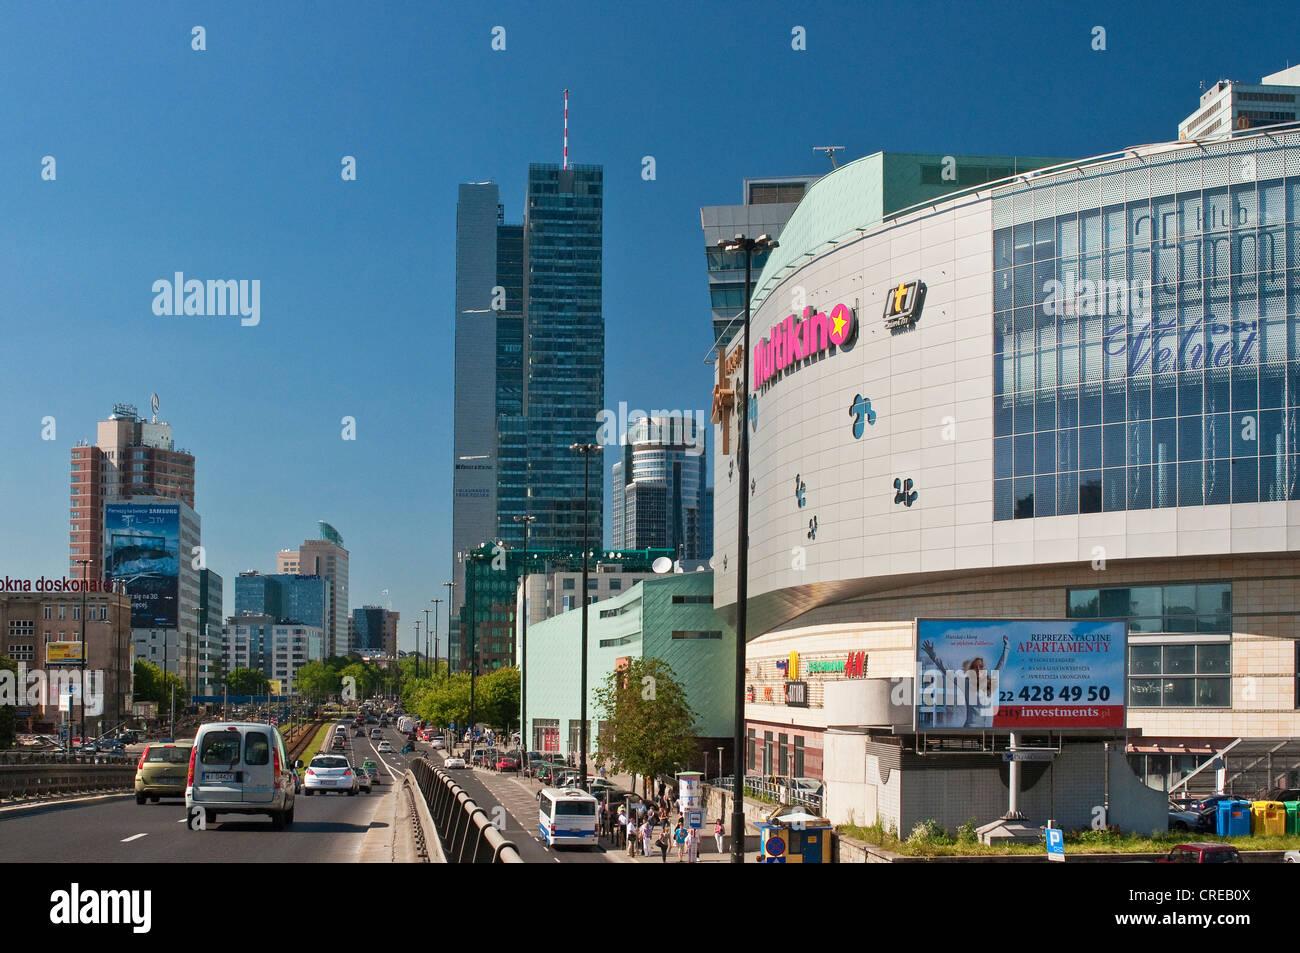 Multikino multiplex movie theater and office buildings, John Paul II Avenue (Aleja Jana Pawla II) in Warsaw, Poland - Stock Image